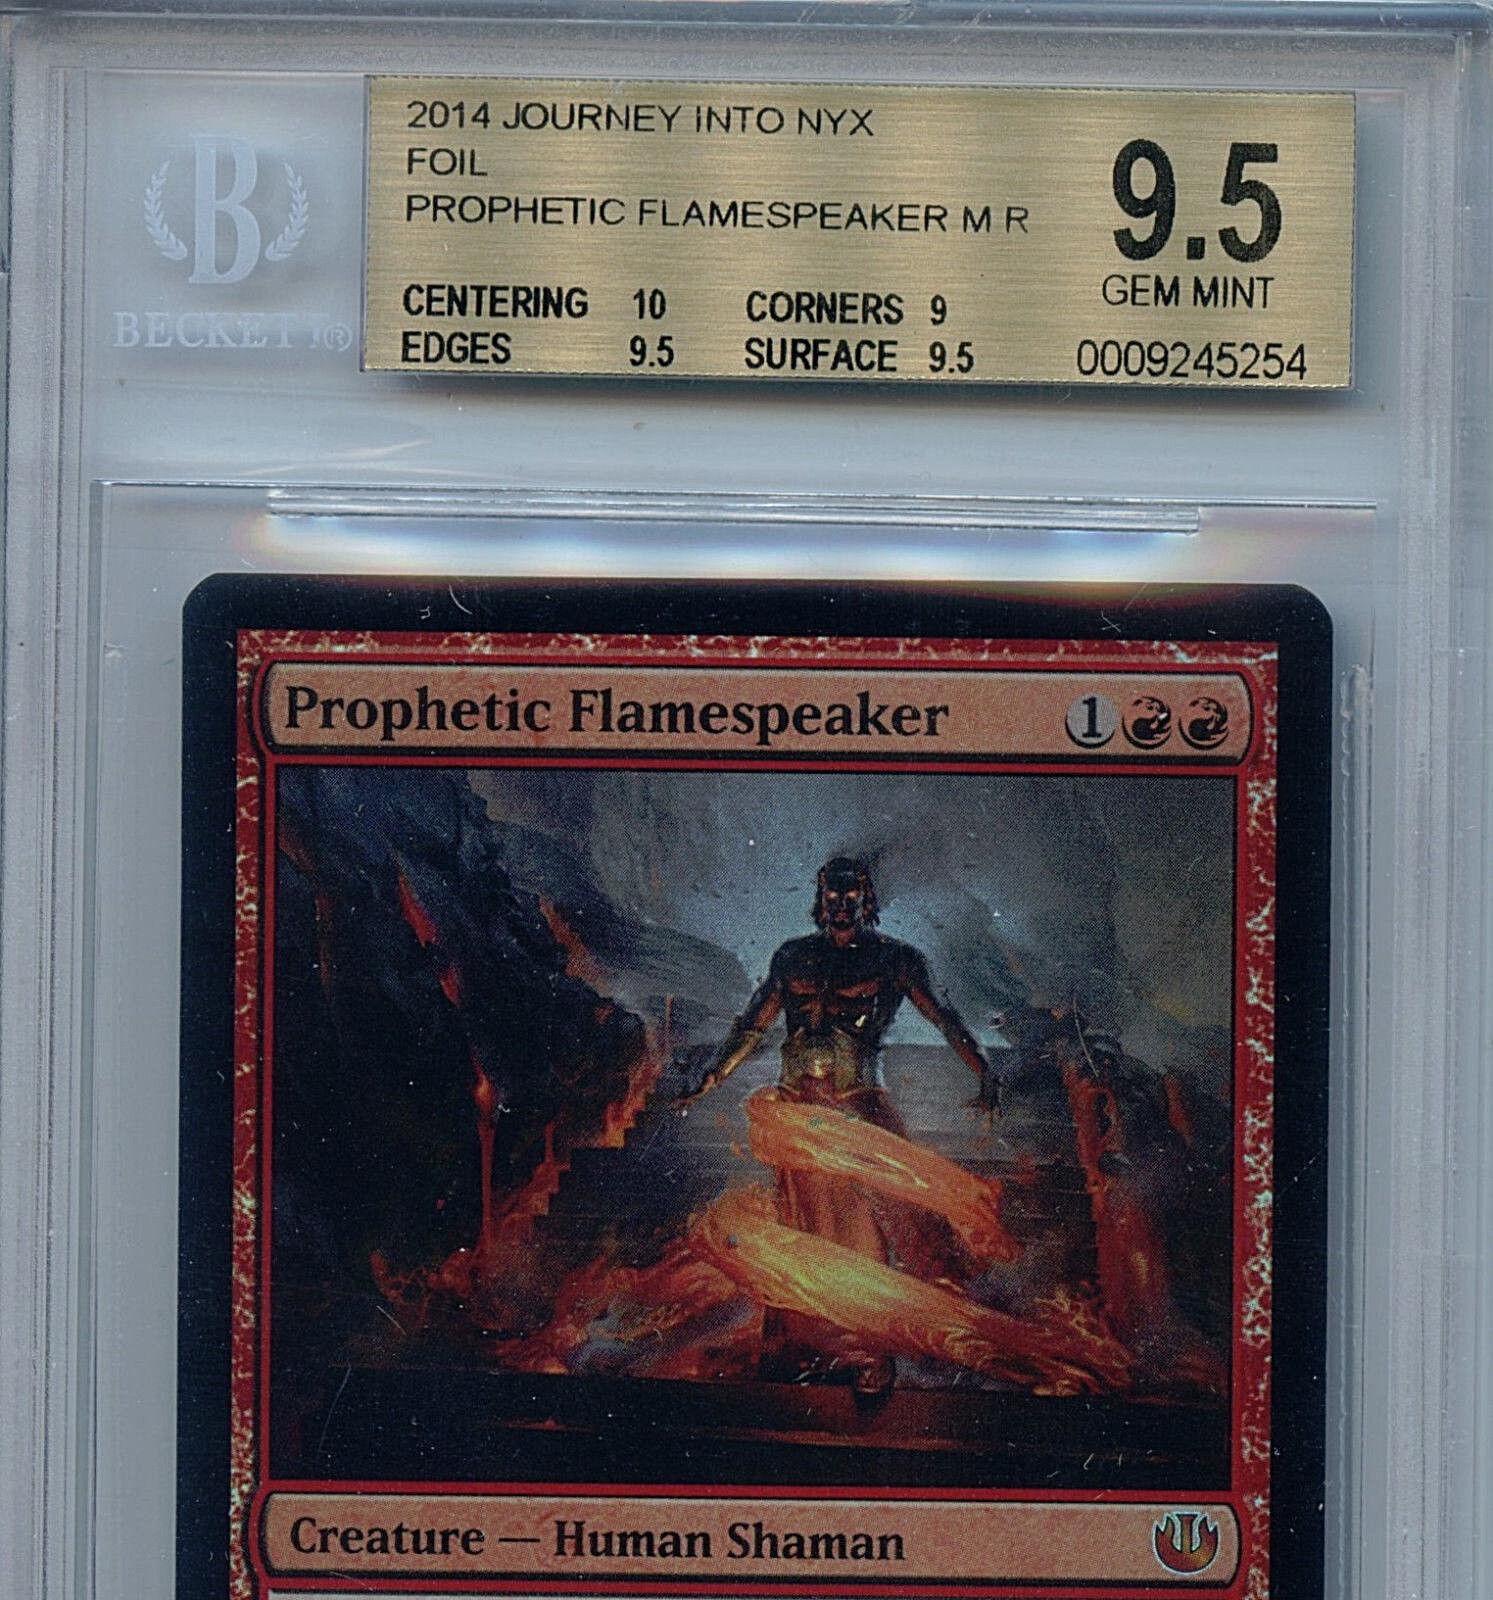 MTG Prophetic Flamespeaker BGS 9.5 Journey Journey Journey Into Nyx Magic Card Mystic Foil 7d78b9